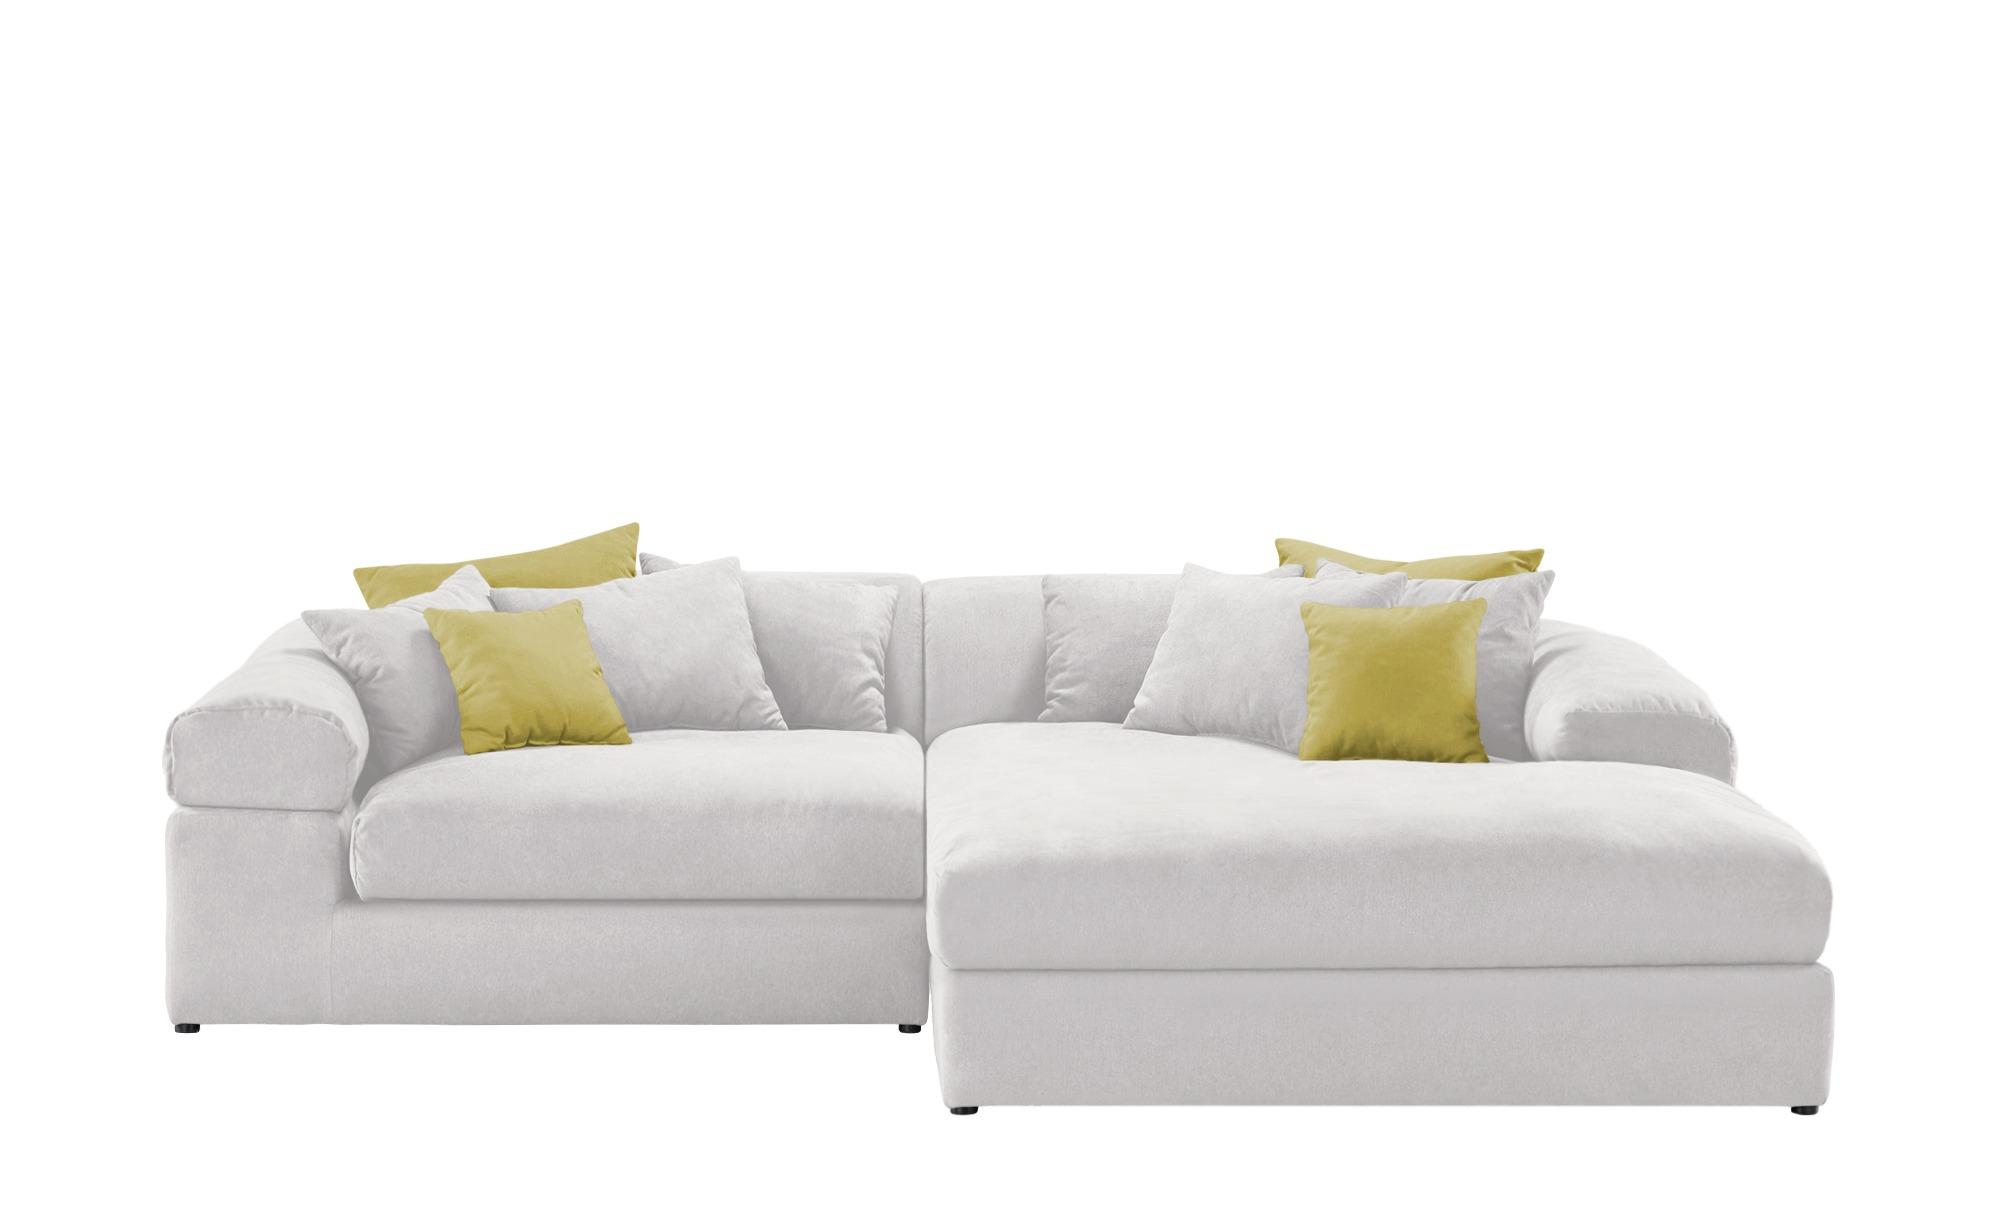 Ecksofa leanea breite h he 81 cm wei online kaufen bei for Ecksofa breite 200 cm